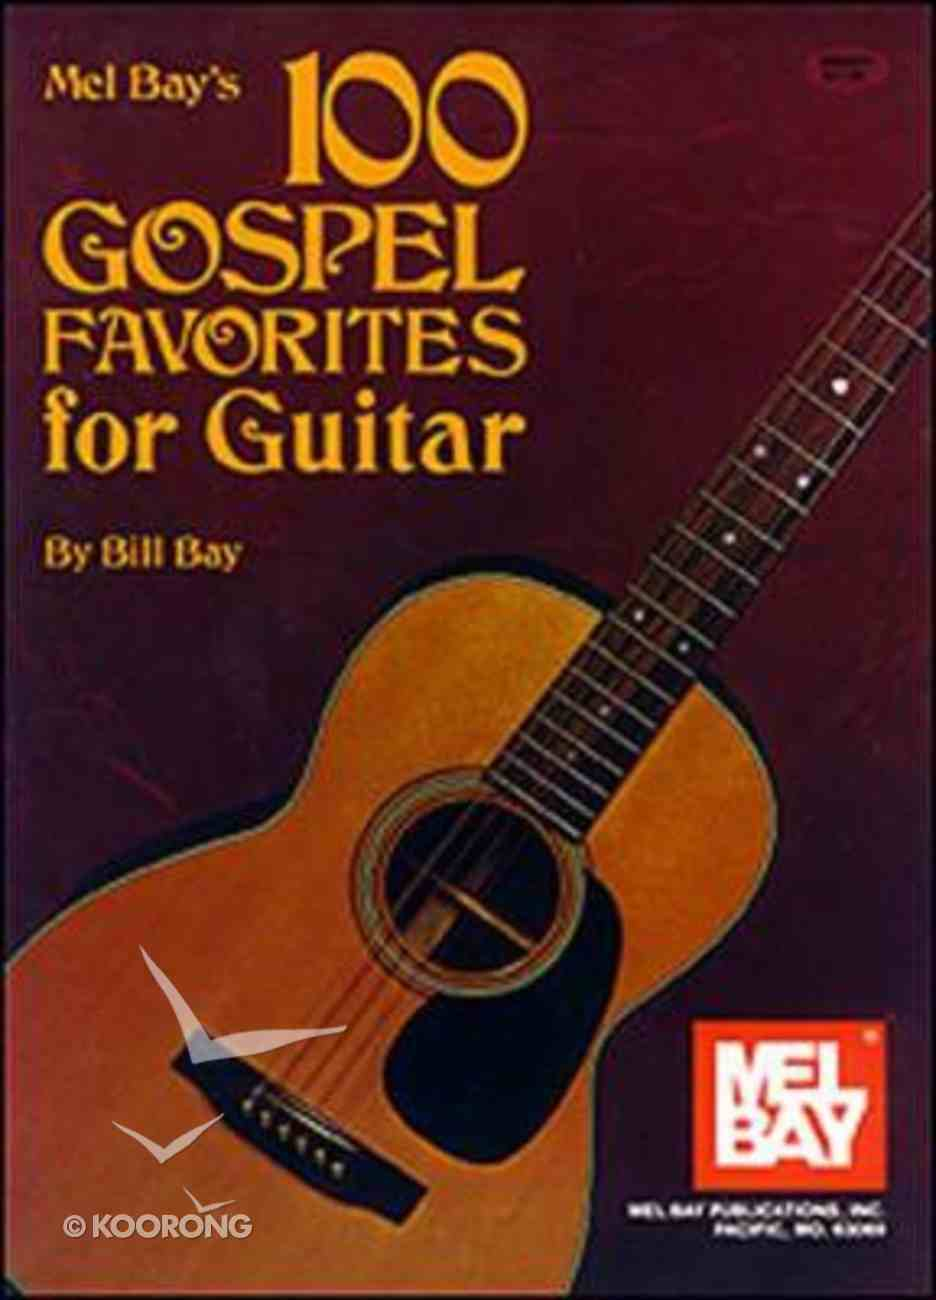 100 Gospel Favorites For Guitar (Music Book) Paperback